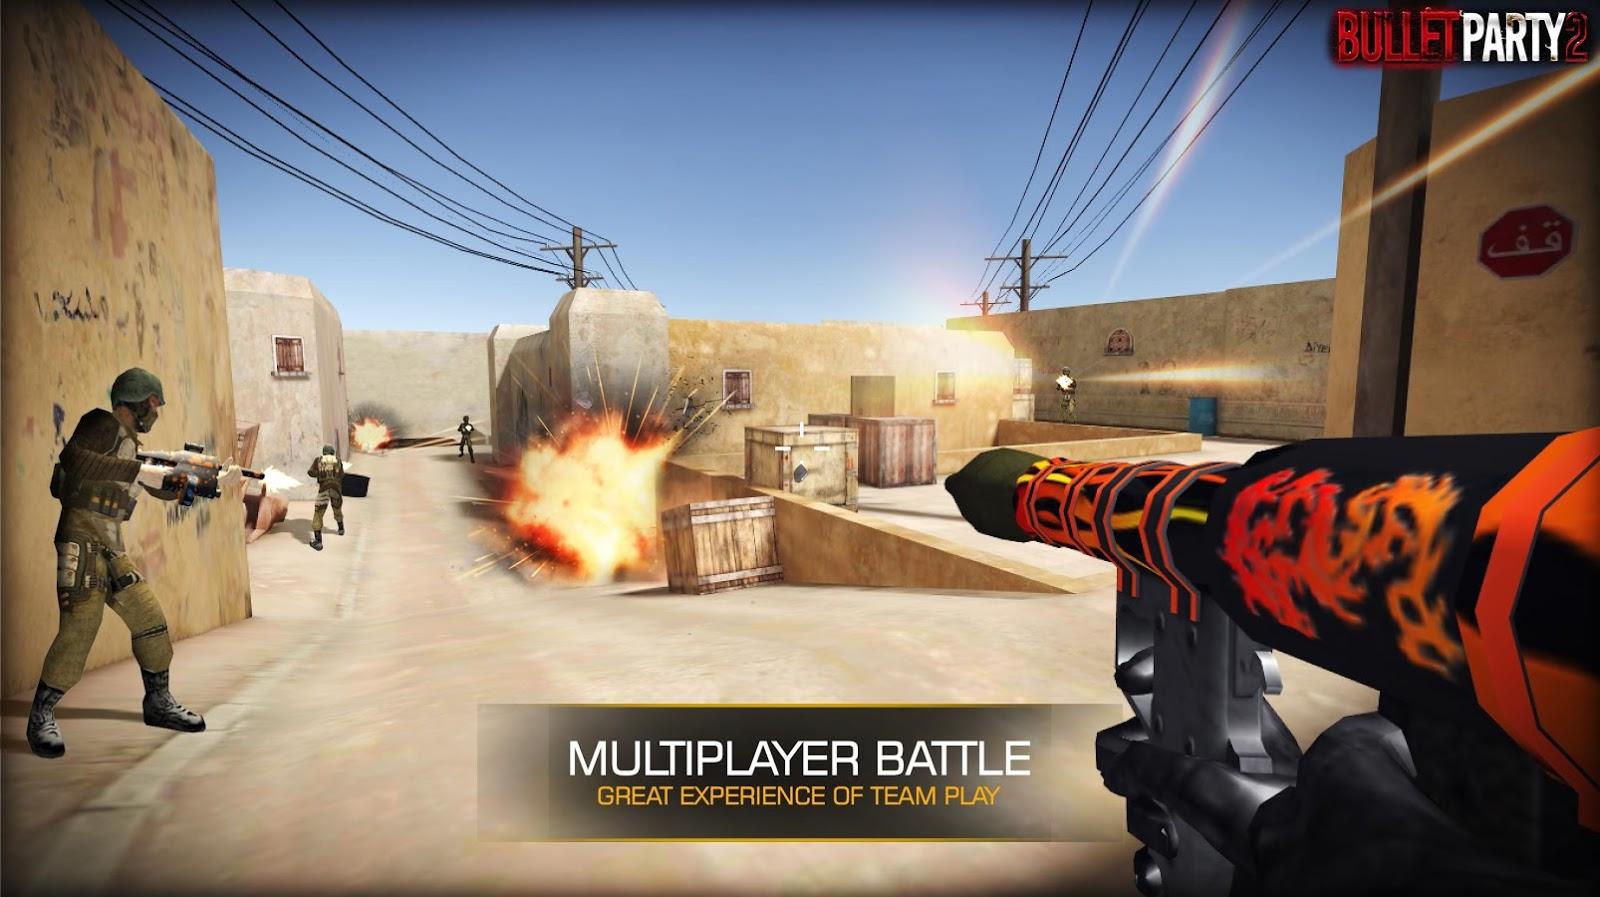 Bullet Party CS 2 GO STRIKE MOD APK terbaru